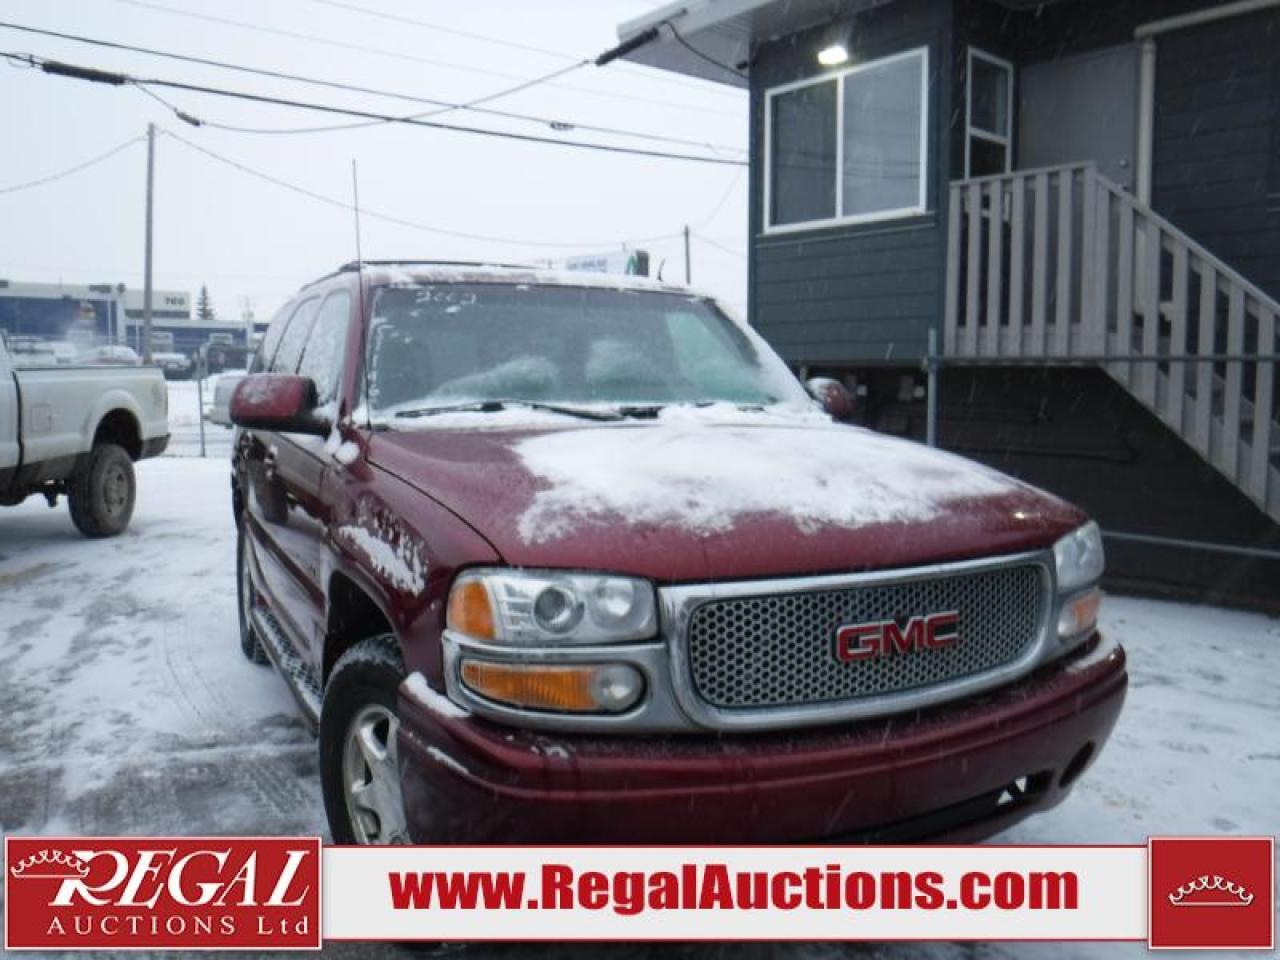 Photo of Red 2002 GMC Yukon Denali